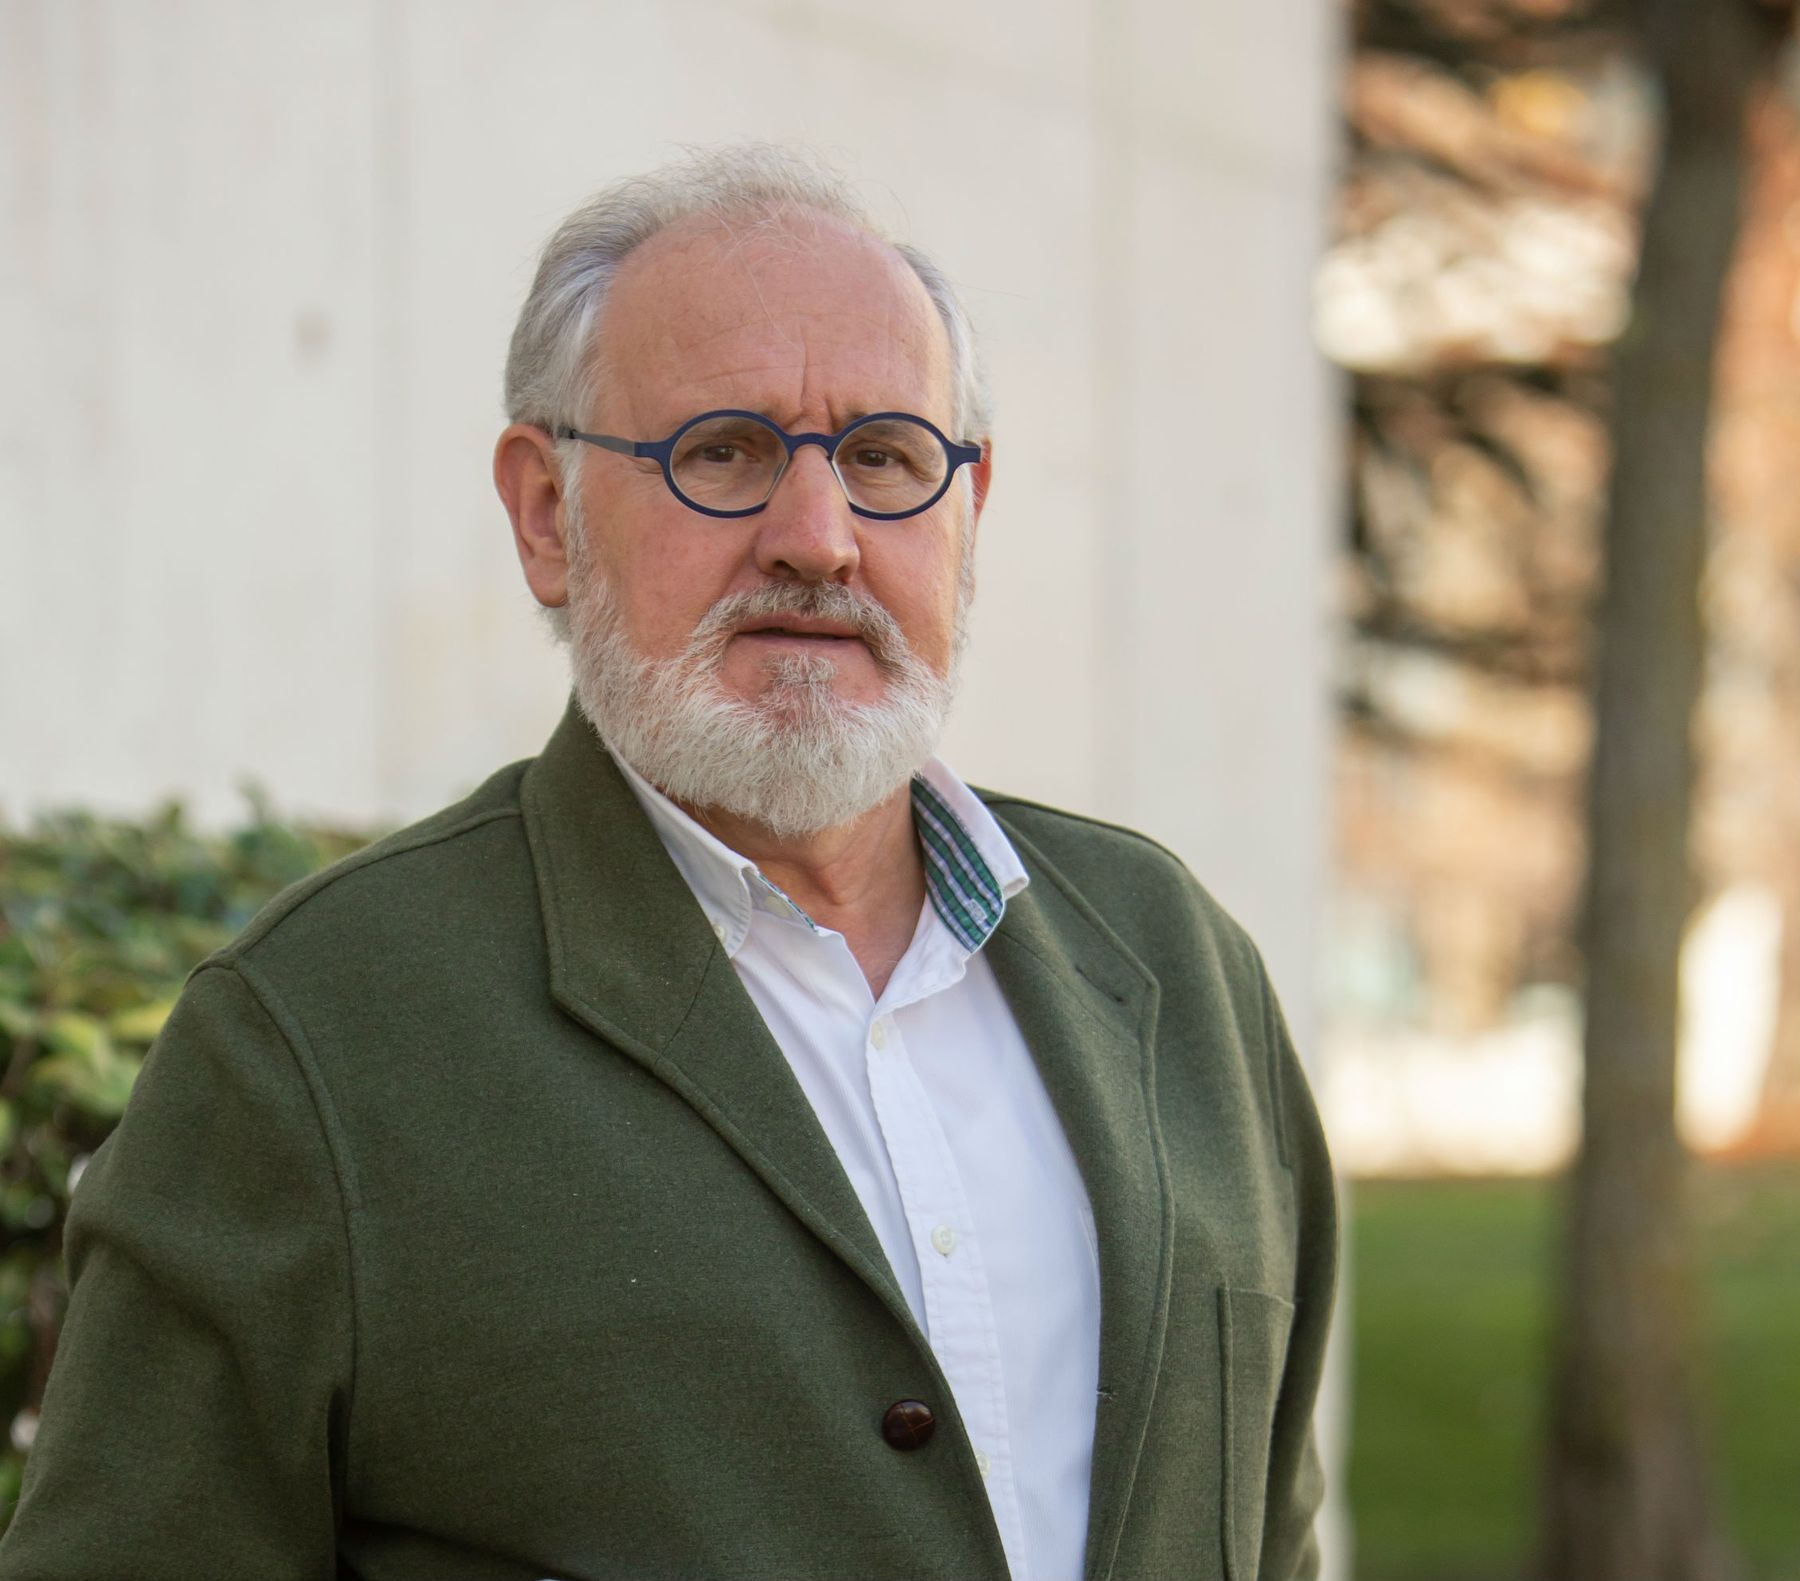 Imagen de Ángel García-Sanz.